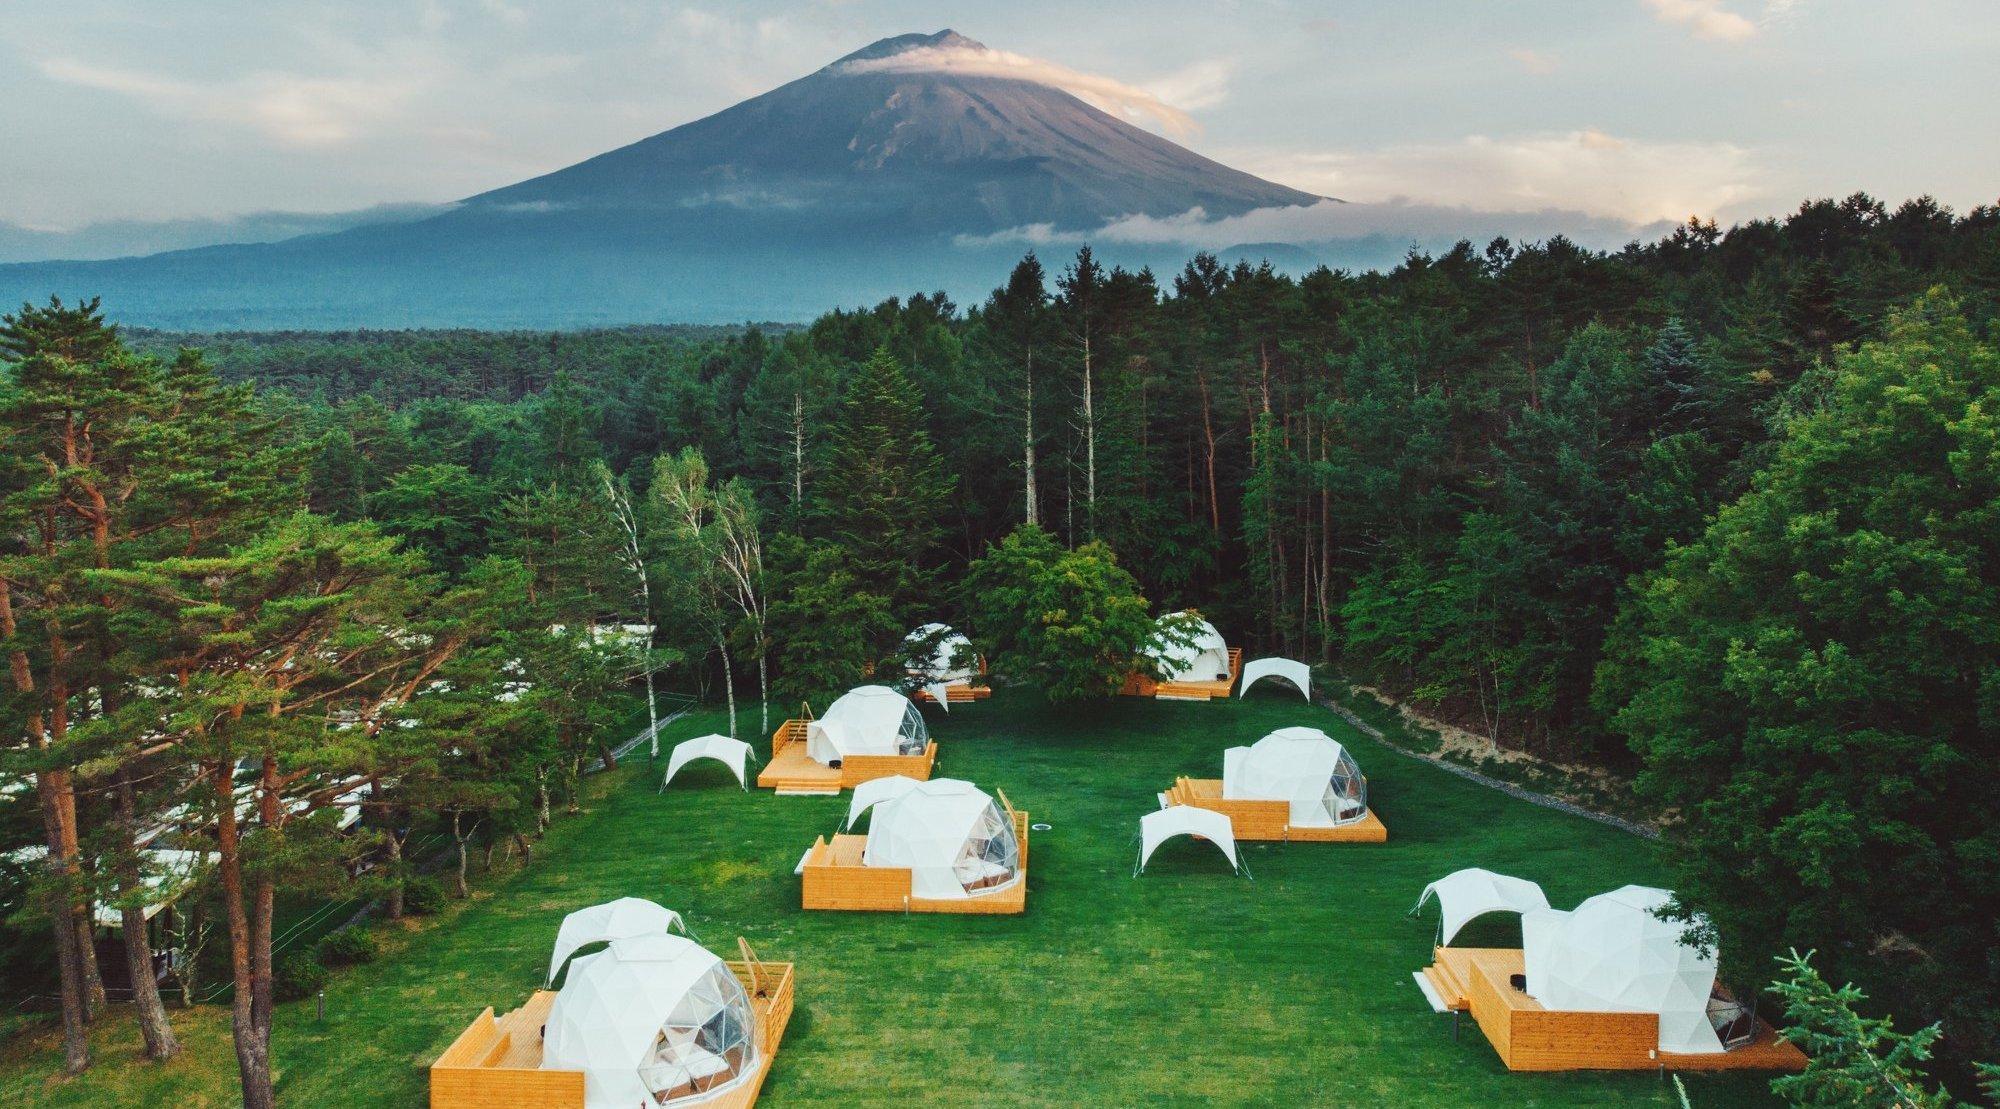 PICA Fujiyama, glamping, Mt Fuji